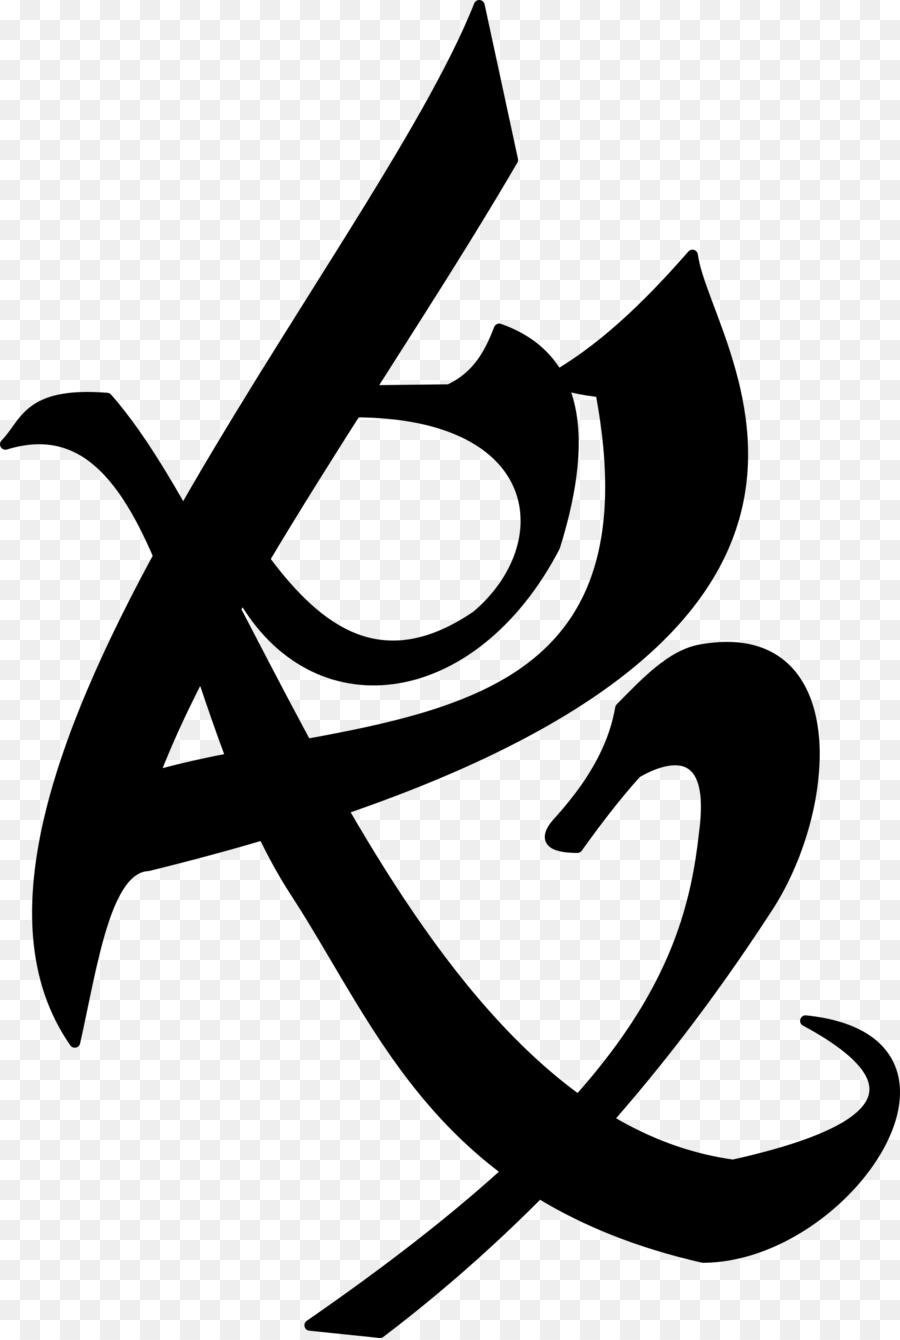 The Mortal Instruments Alec Lightwood Clary Fray Runes Parabatai